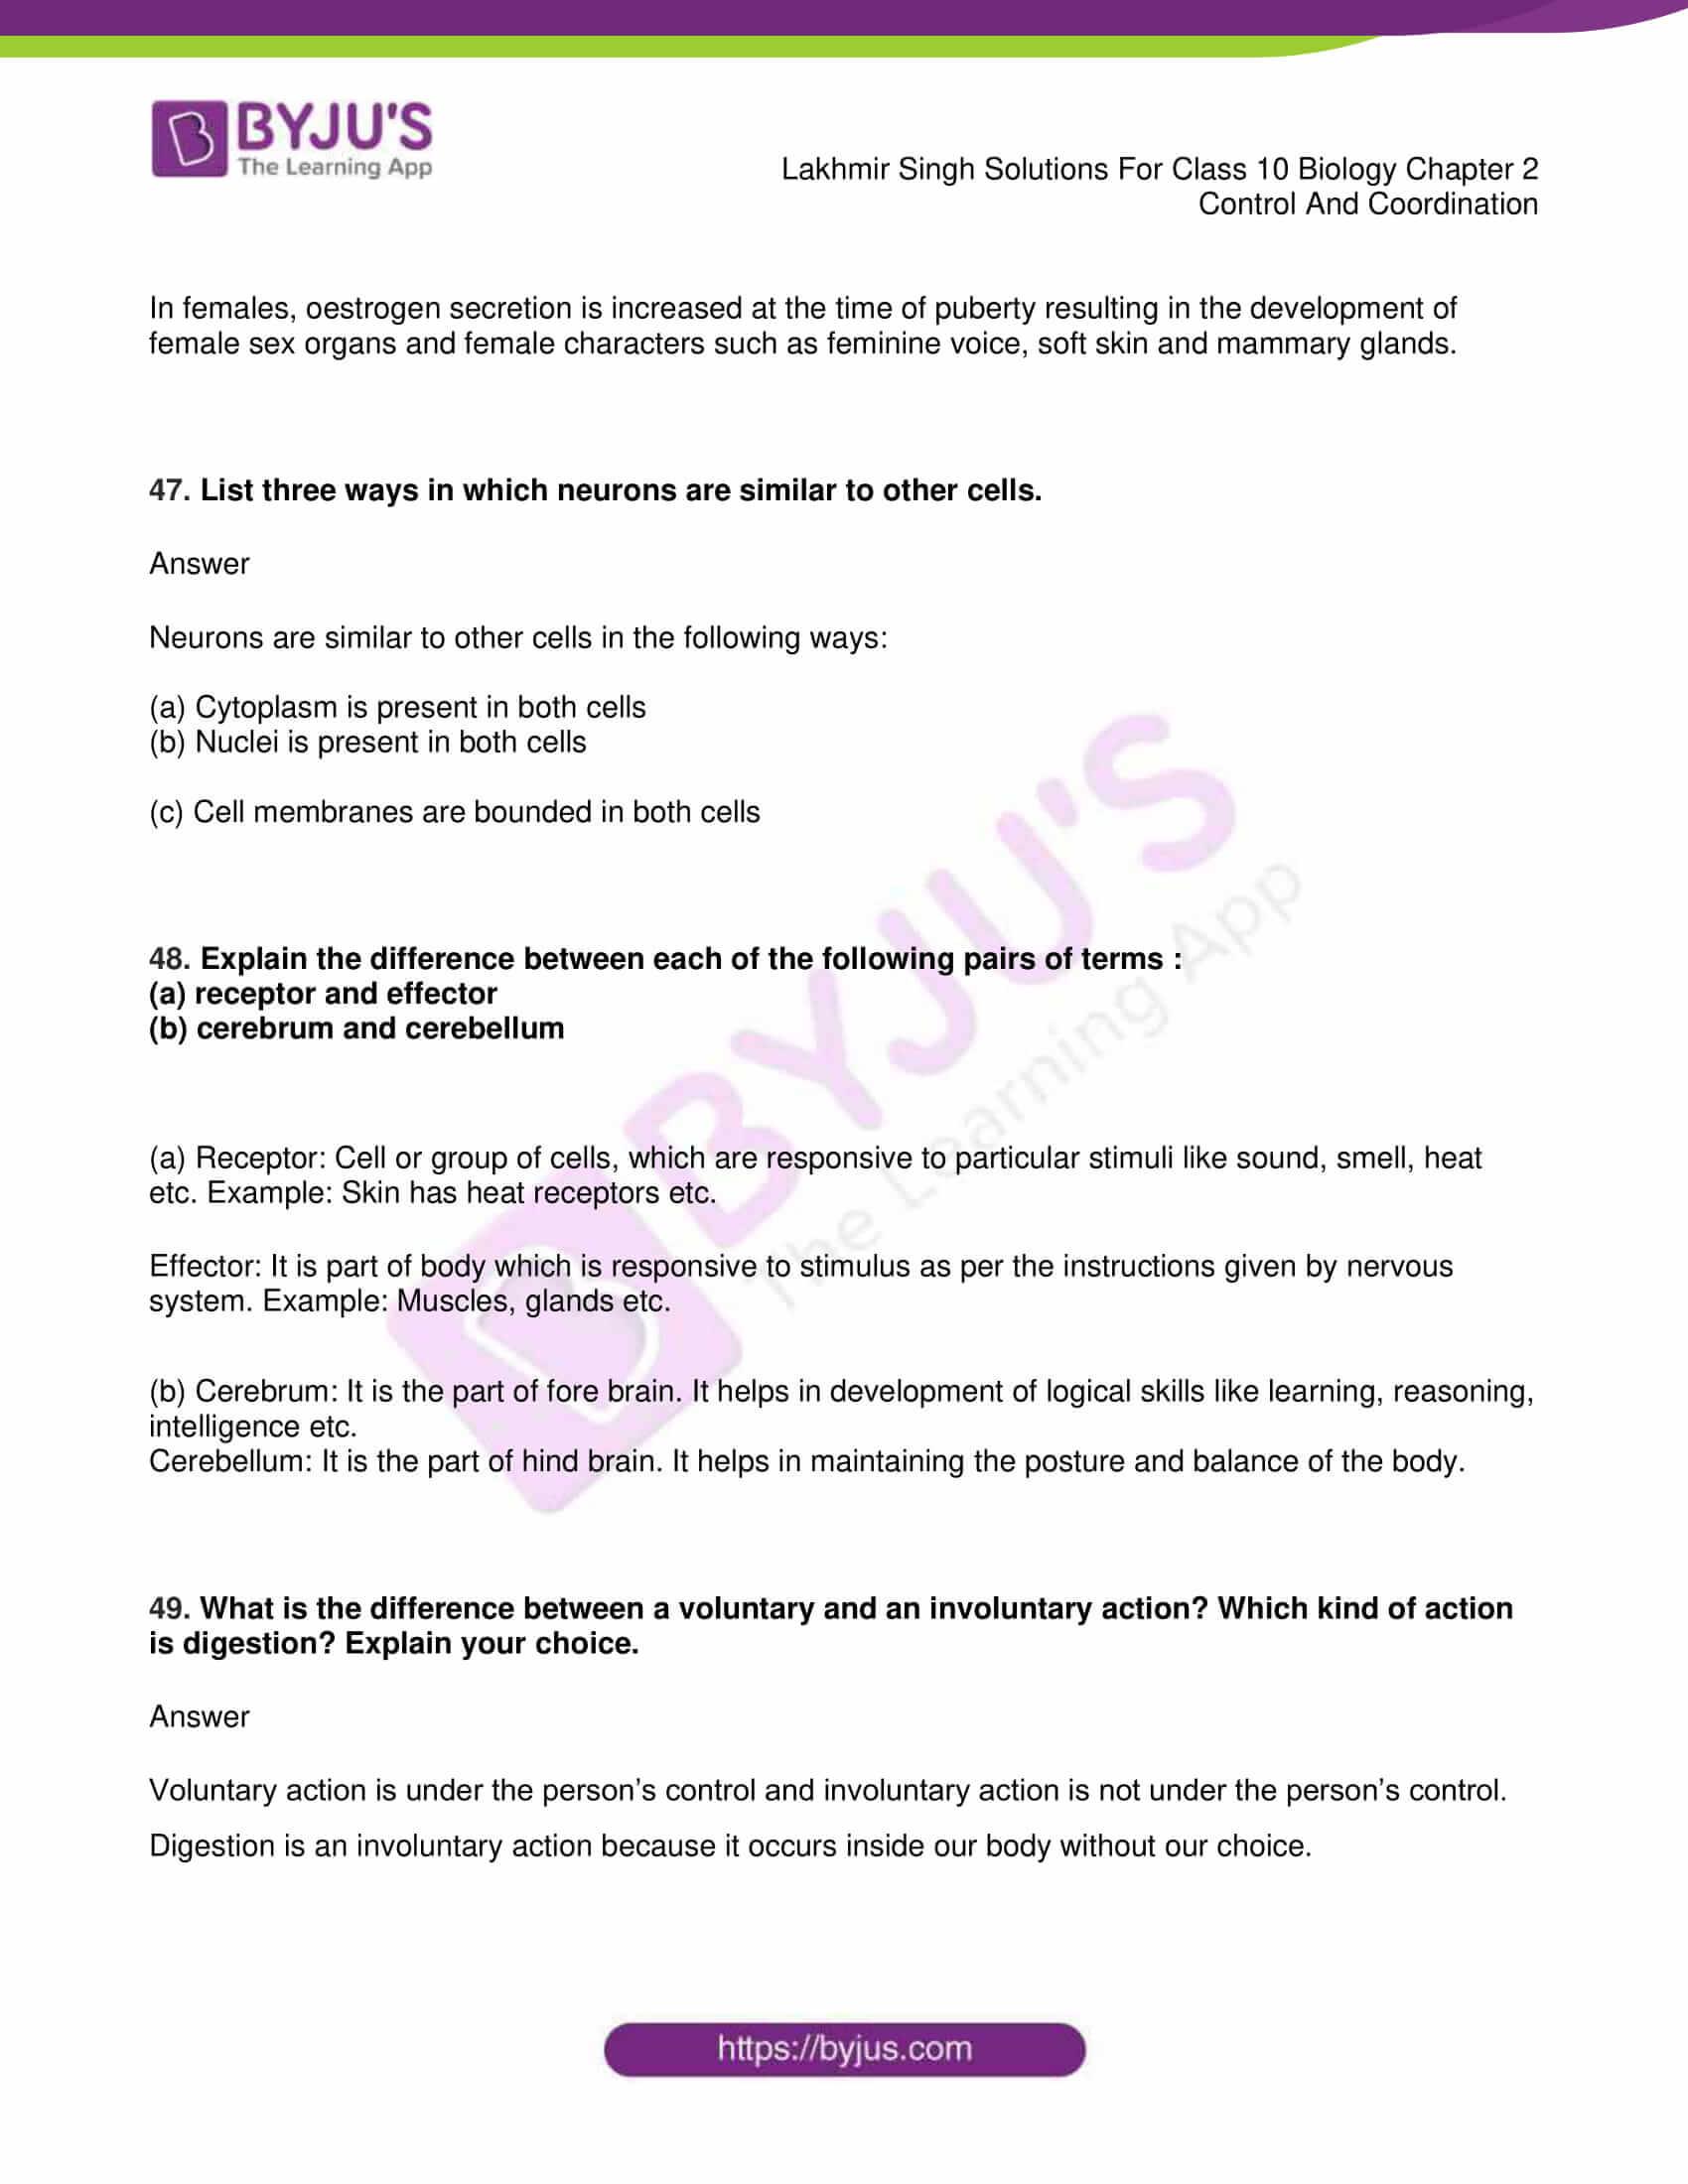 lakhmir singh sol class 10 biology chapter 2 34